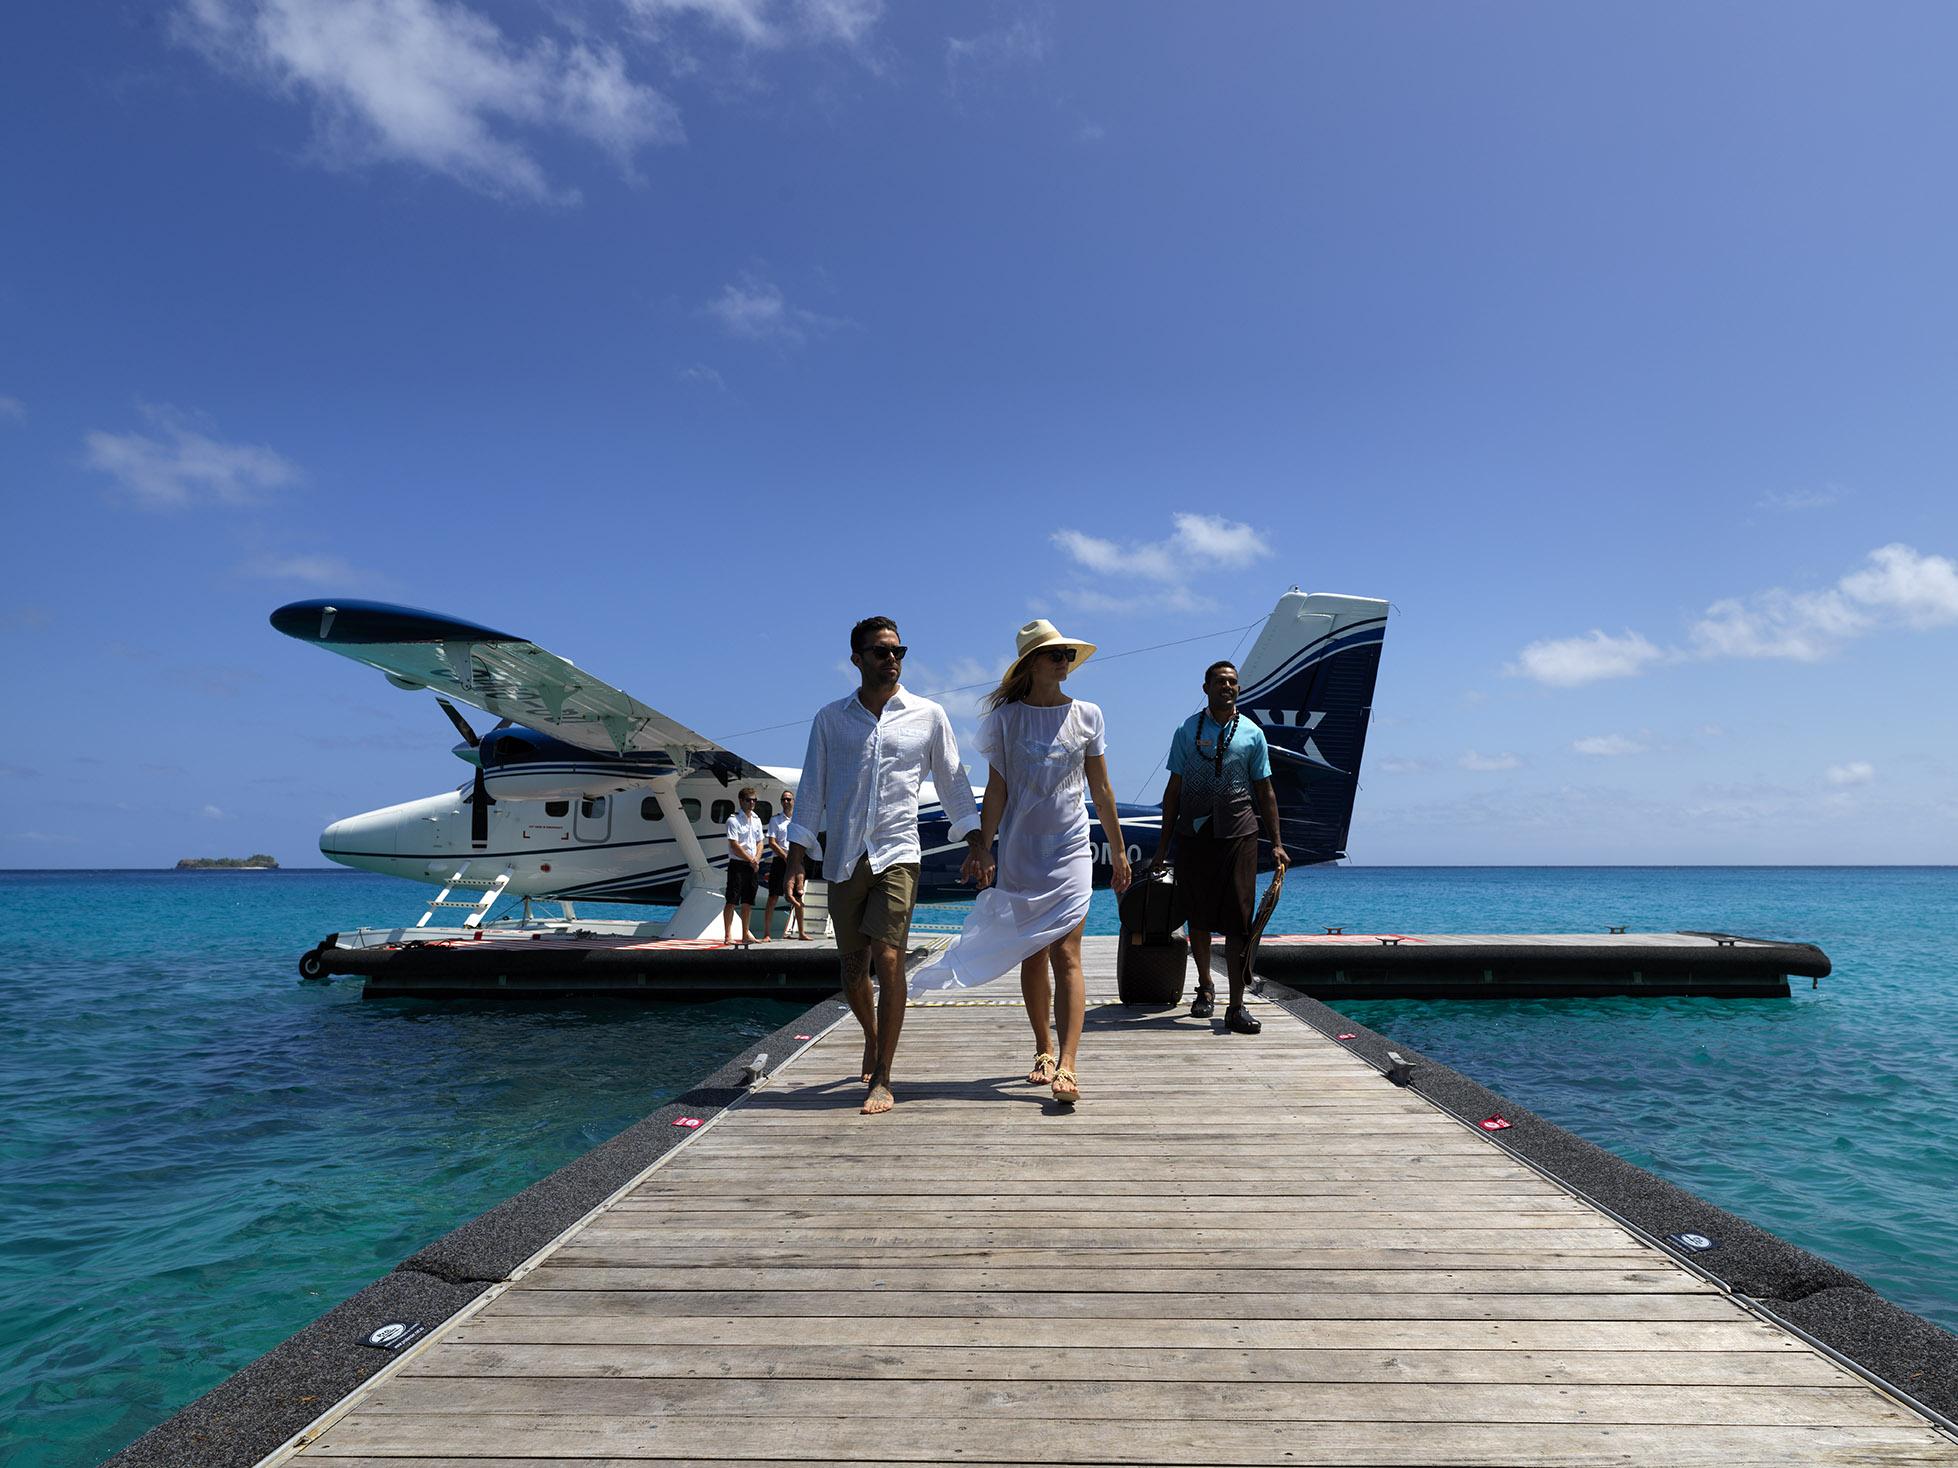 7. Seaplane.jpg